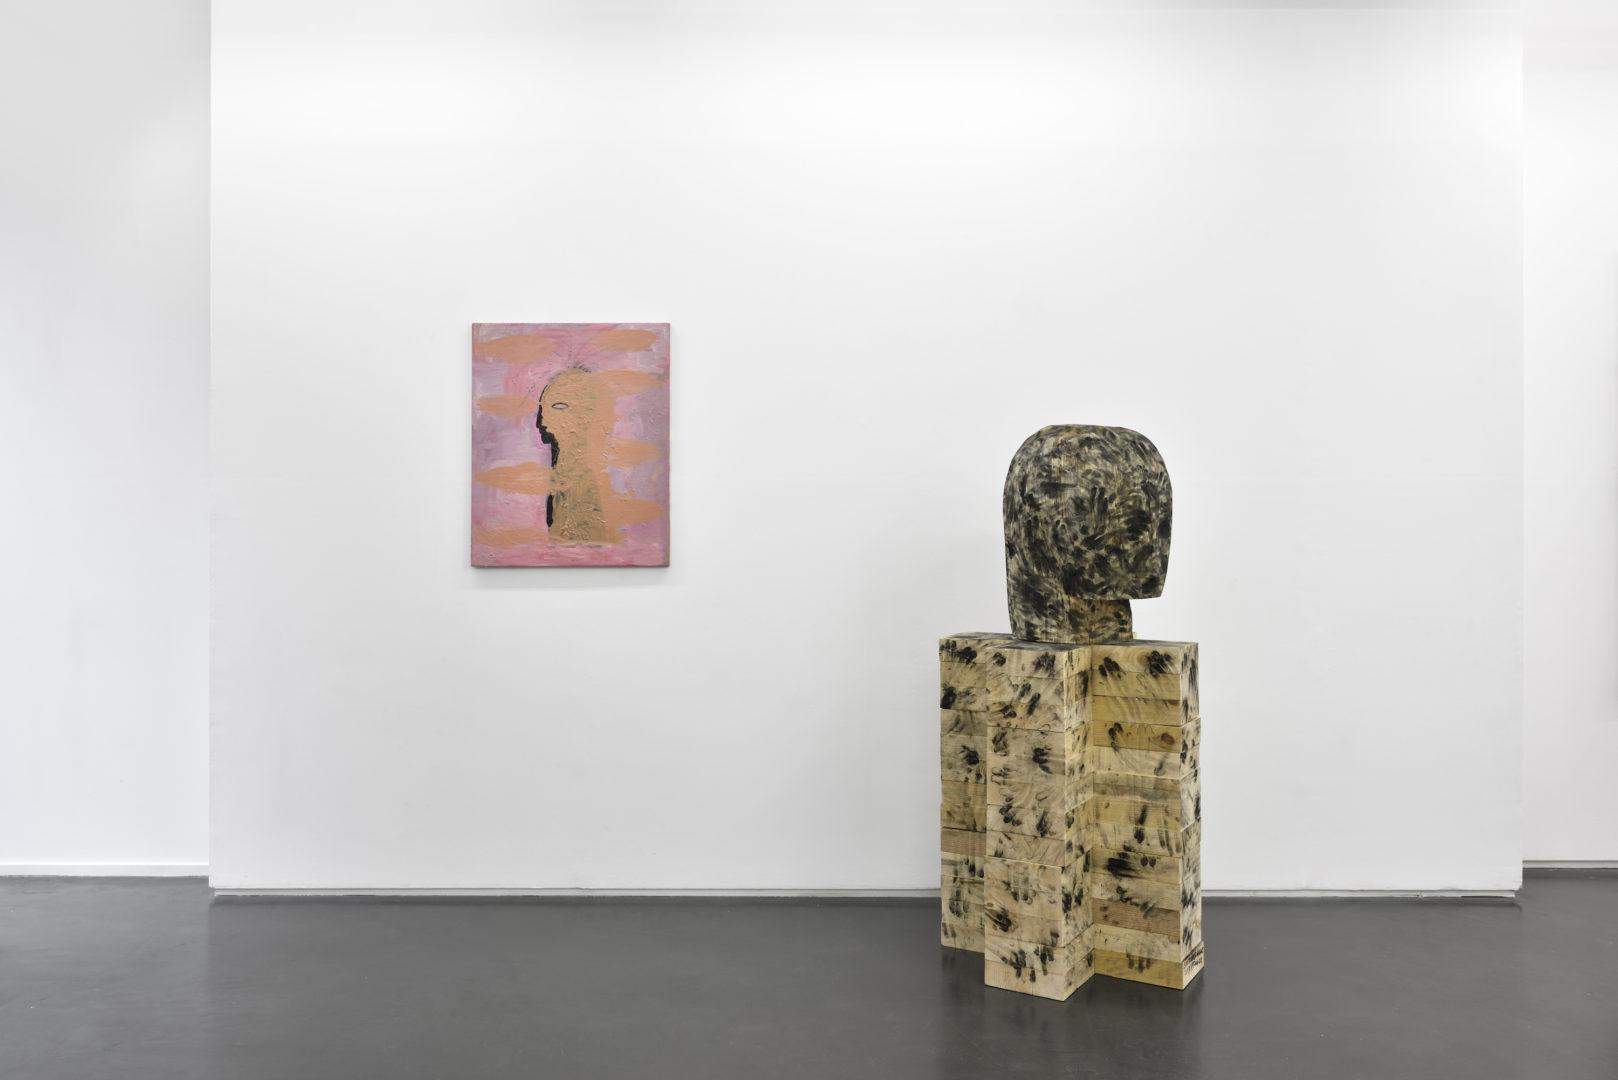 Vue de l'exposition Phantoms of inspiration - Galerie Maïa Muller, 2018 ©Rebecca Fanuele